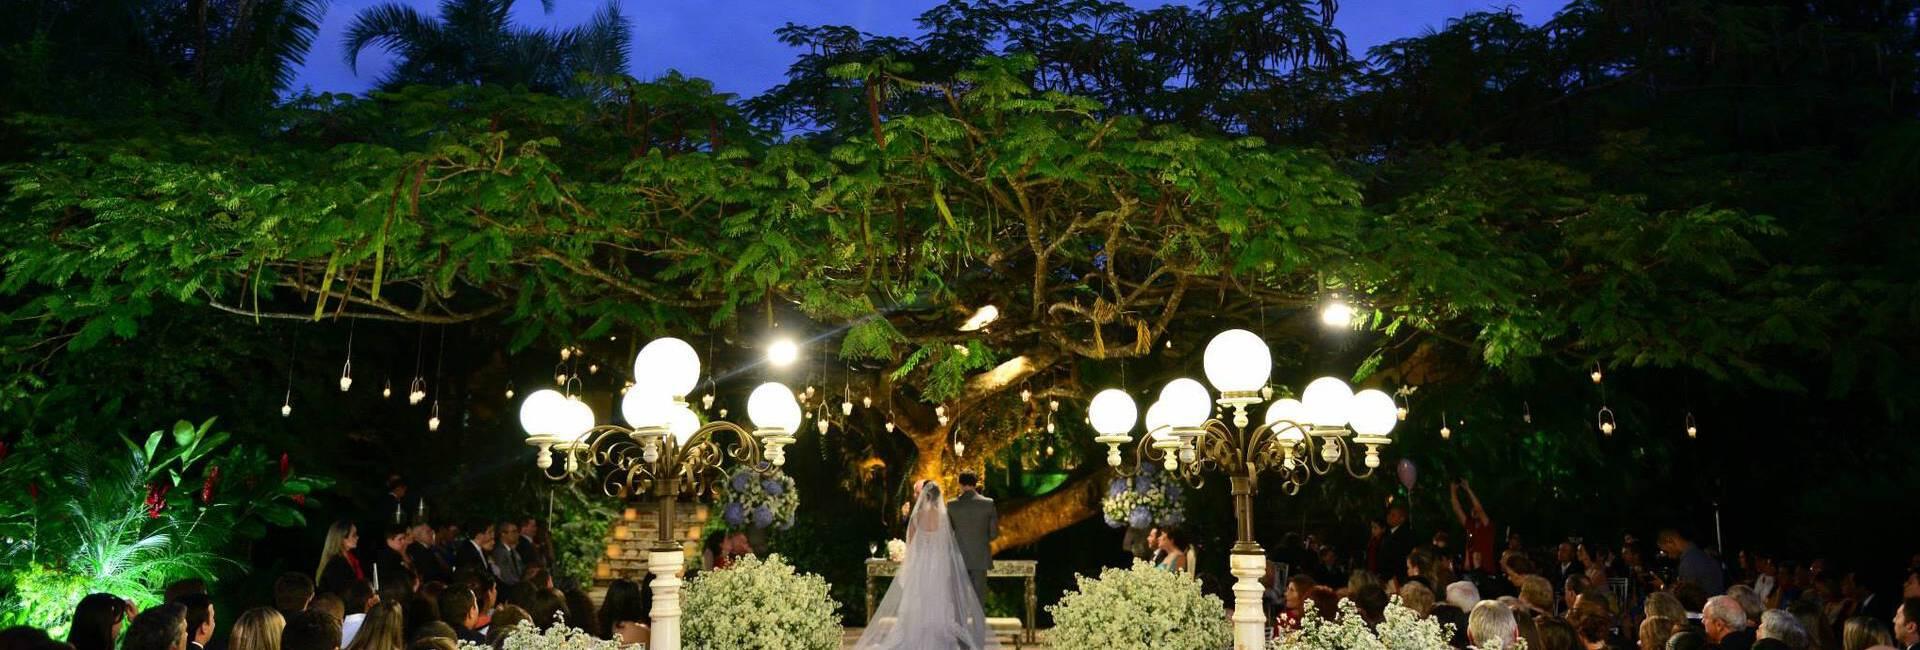 Casamento de Adriana & Marlon